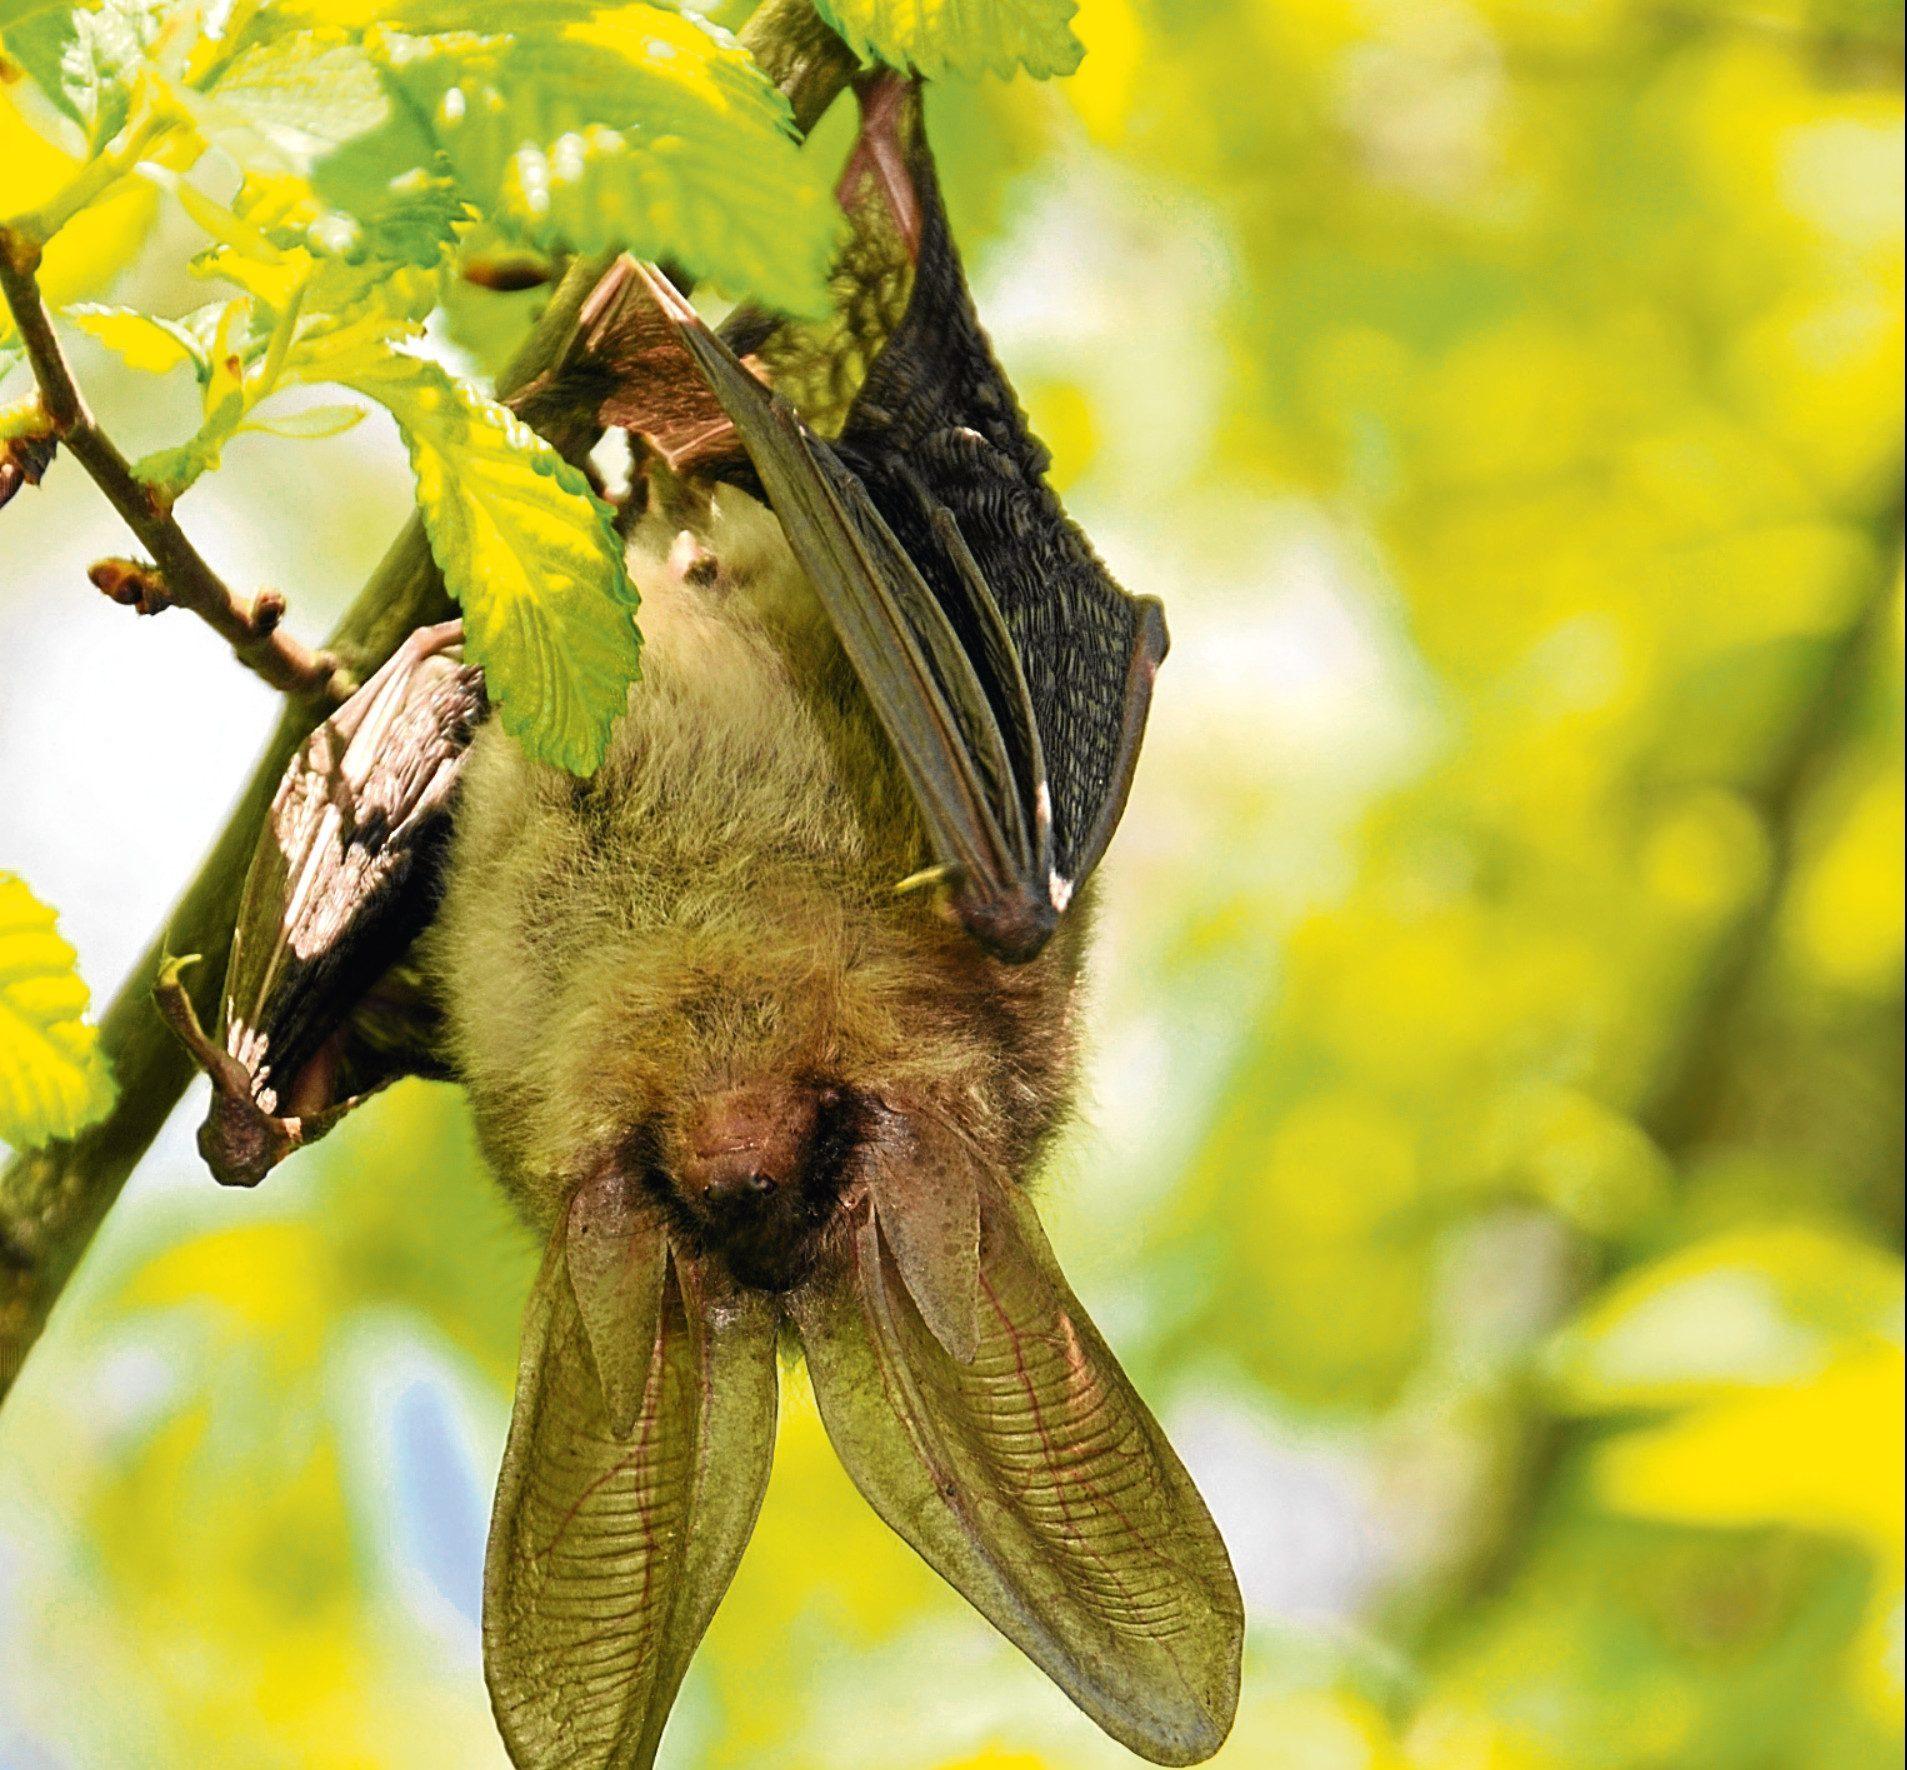 A pipistrelle bat